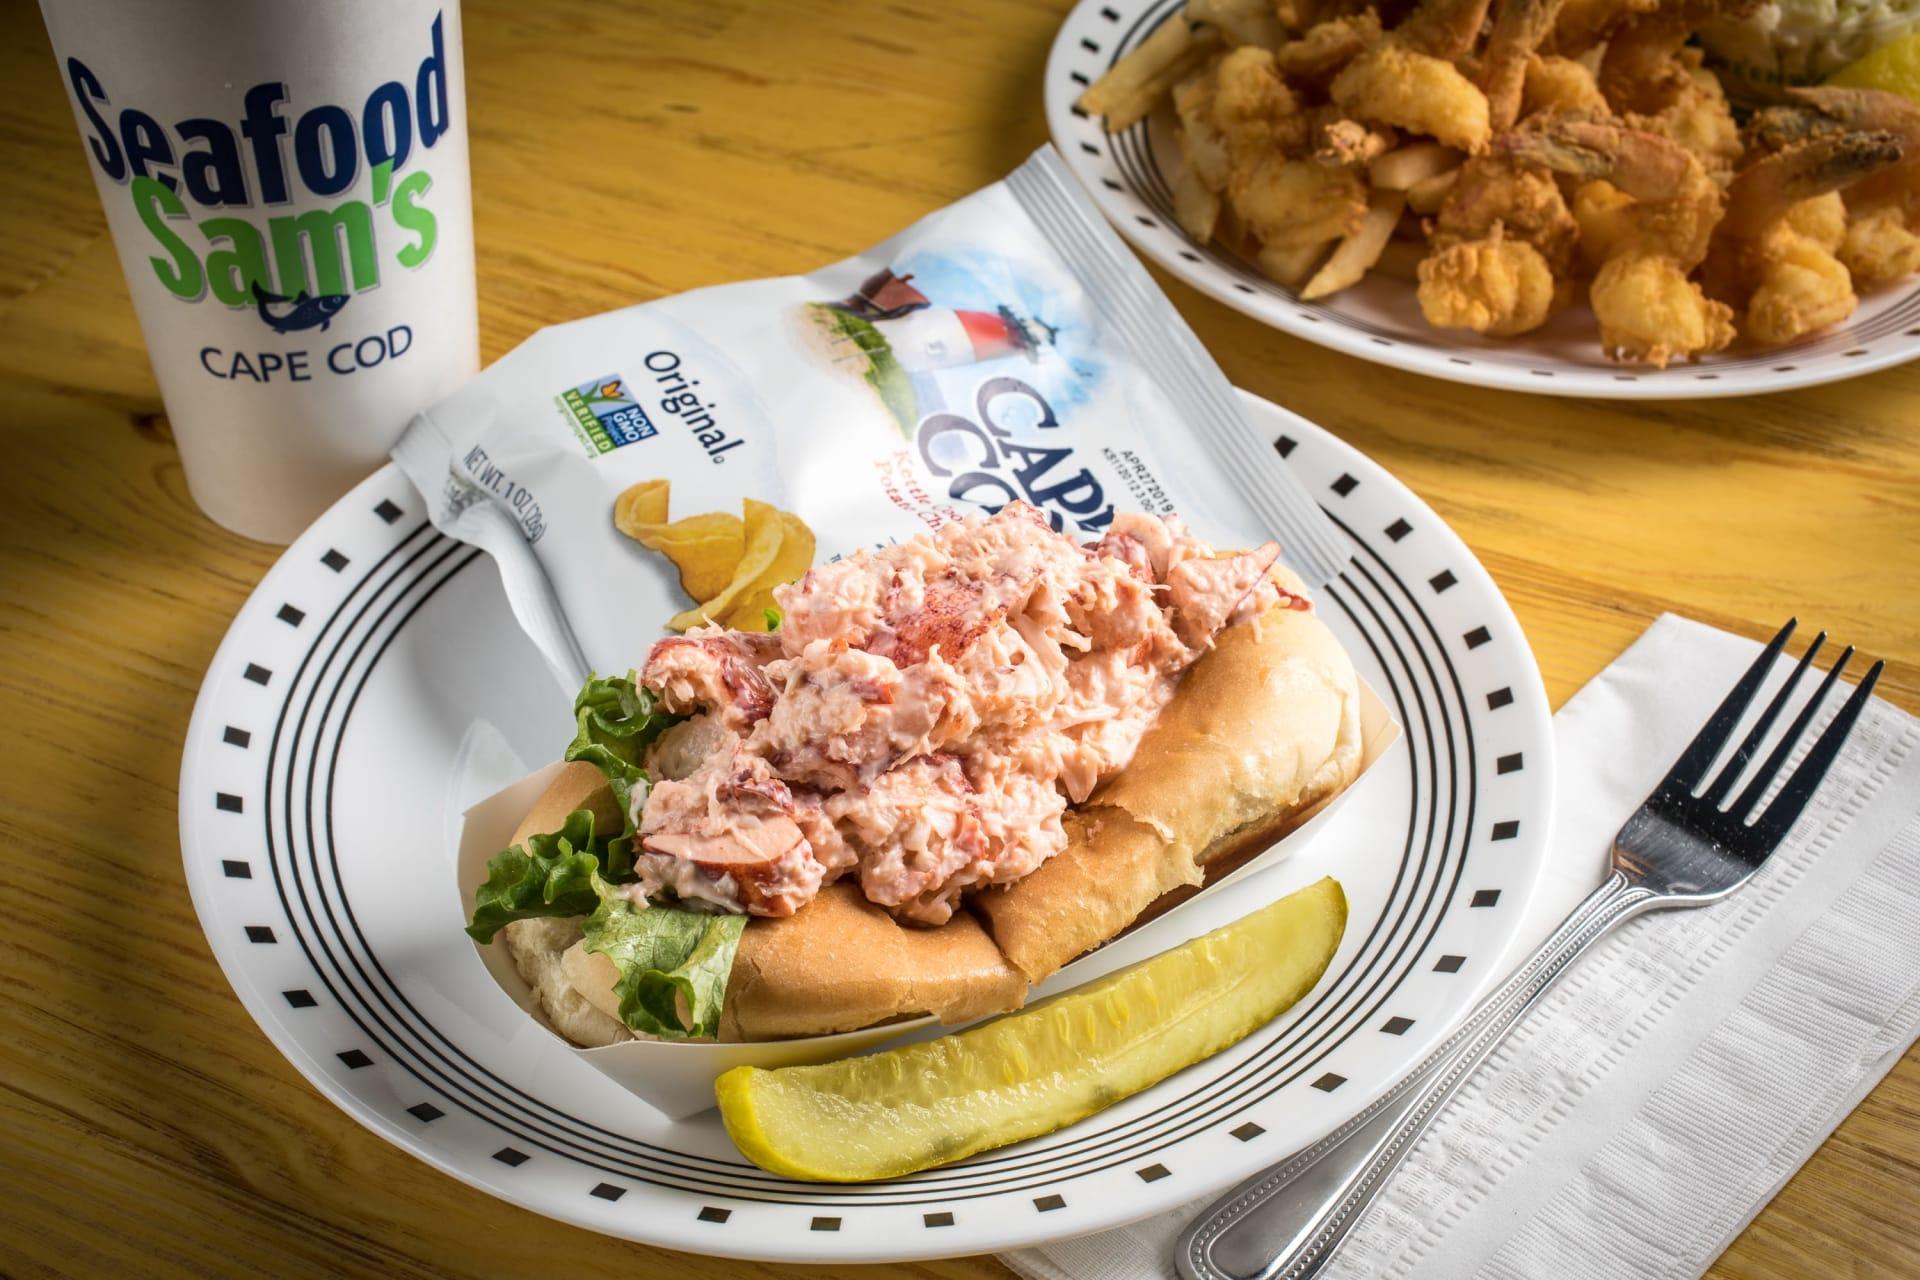 Seafood Sam's Blog